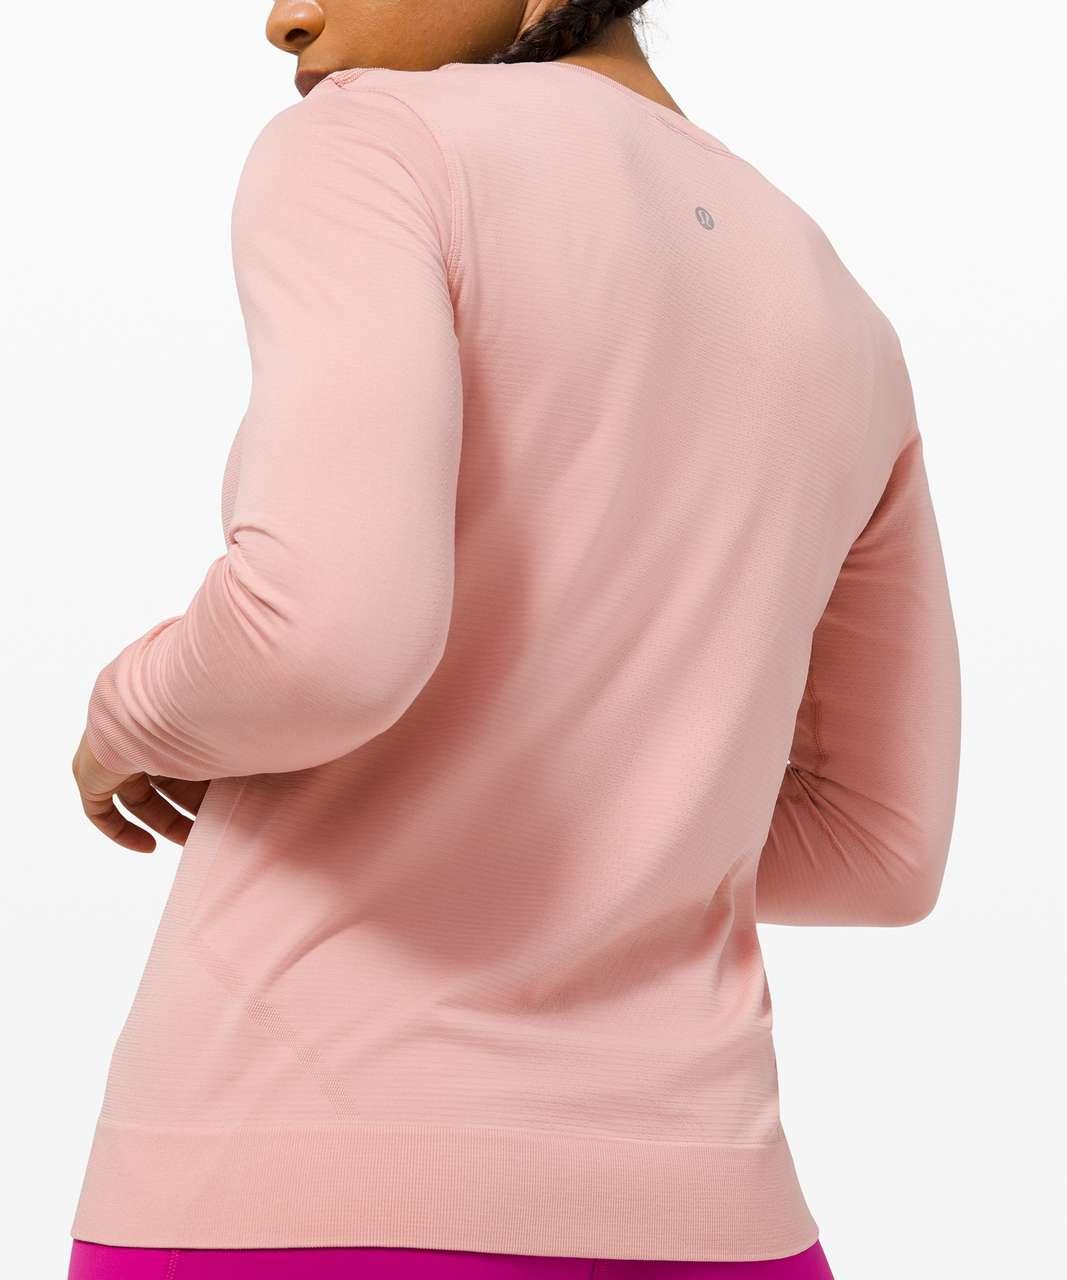 Lululemon Swiftly Breathe Long Sleeve - Pink Puff / Pink Puff